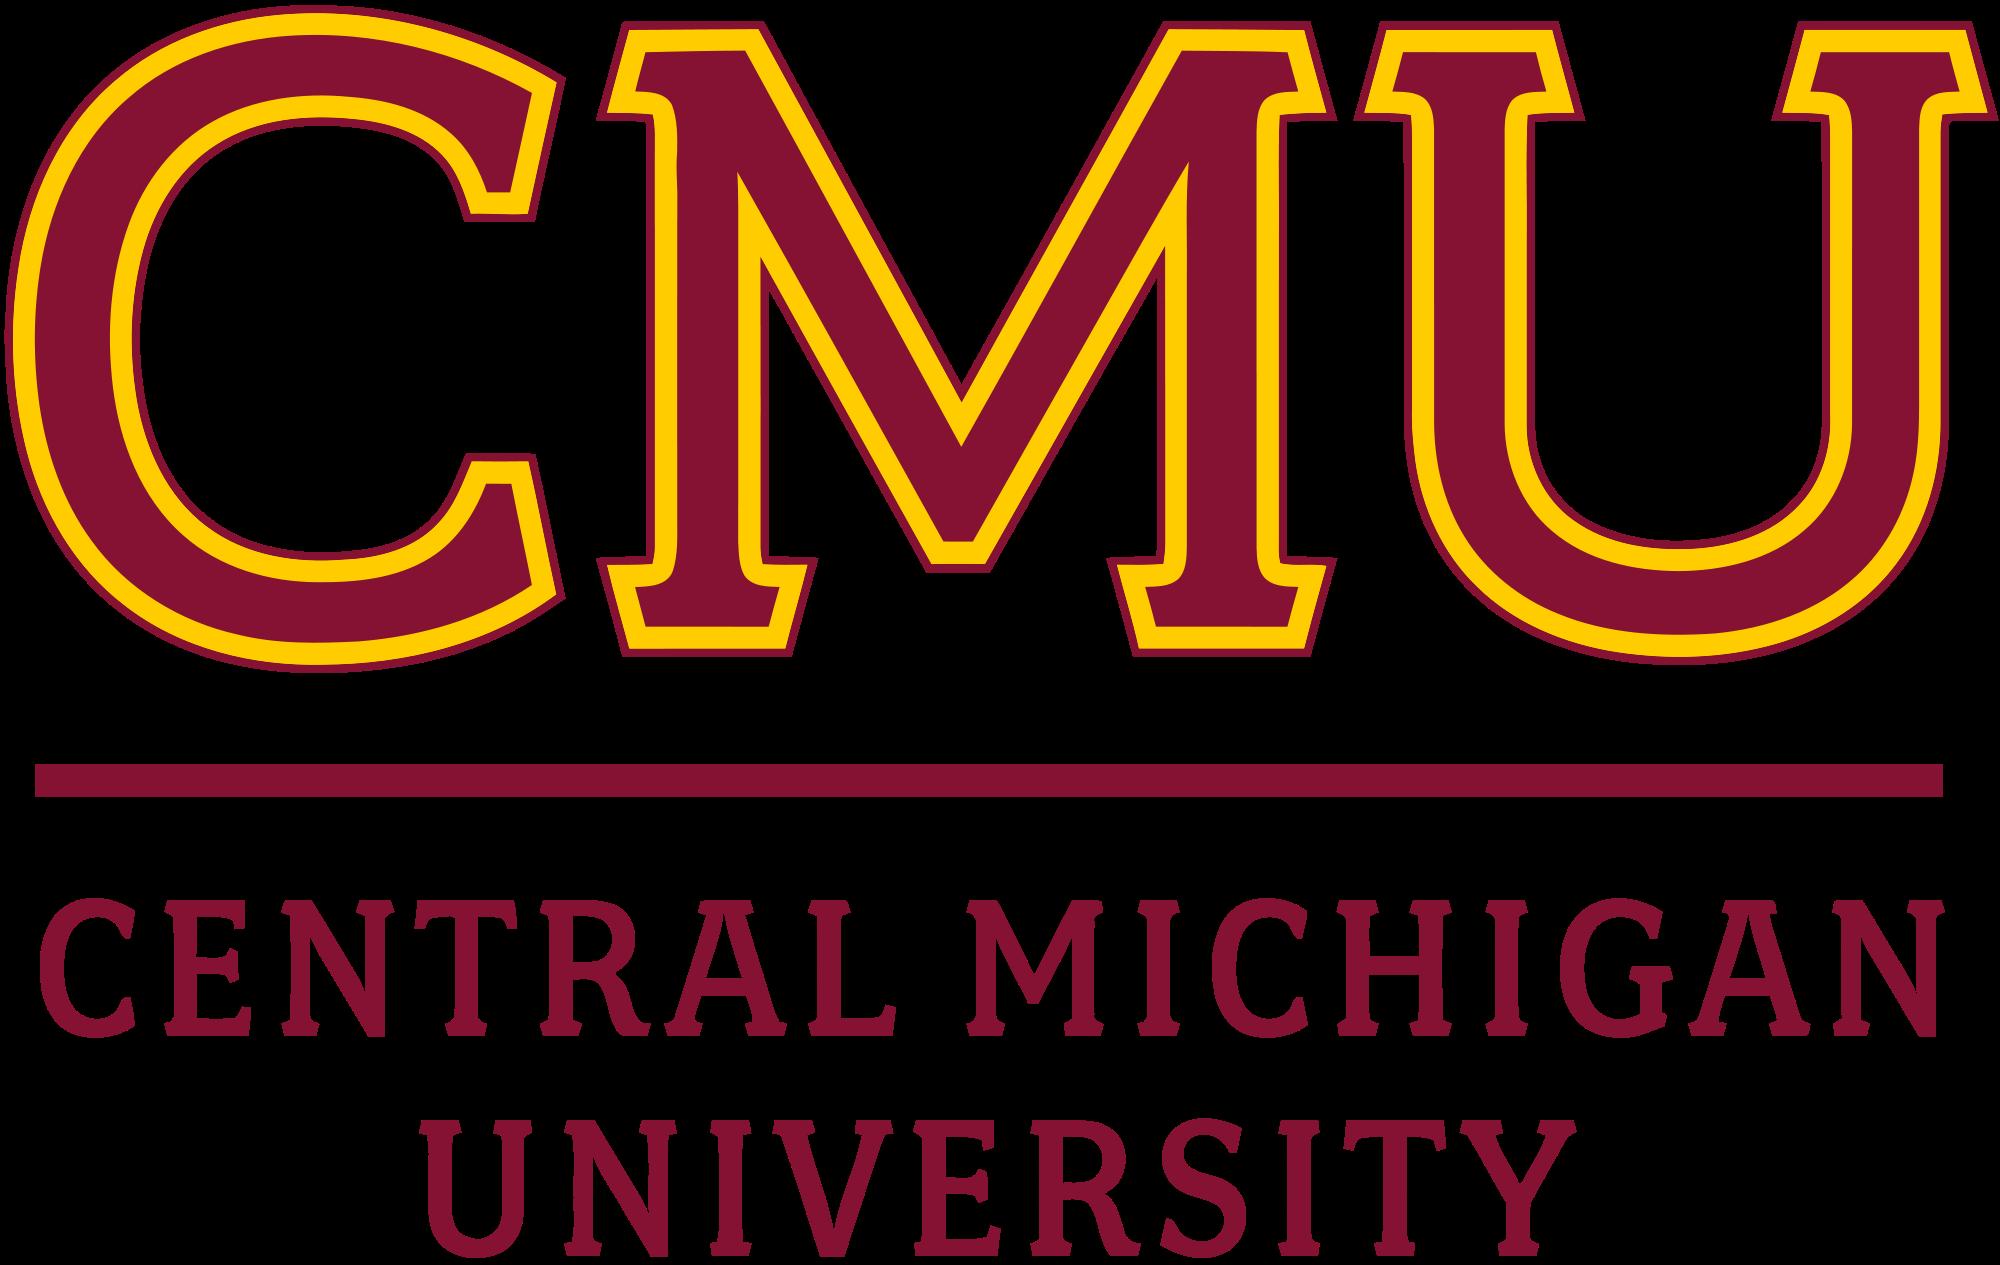 Central Michigan University